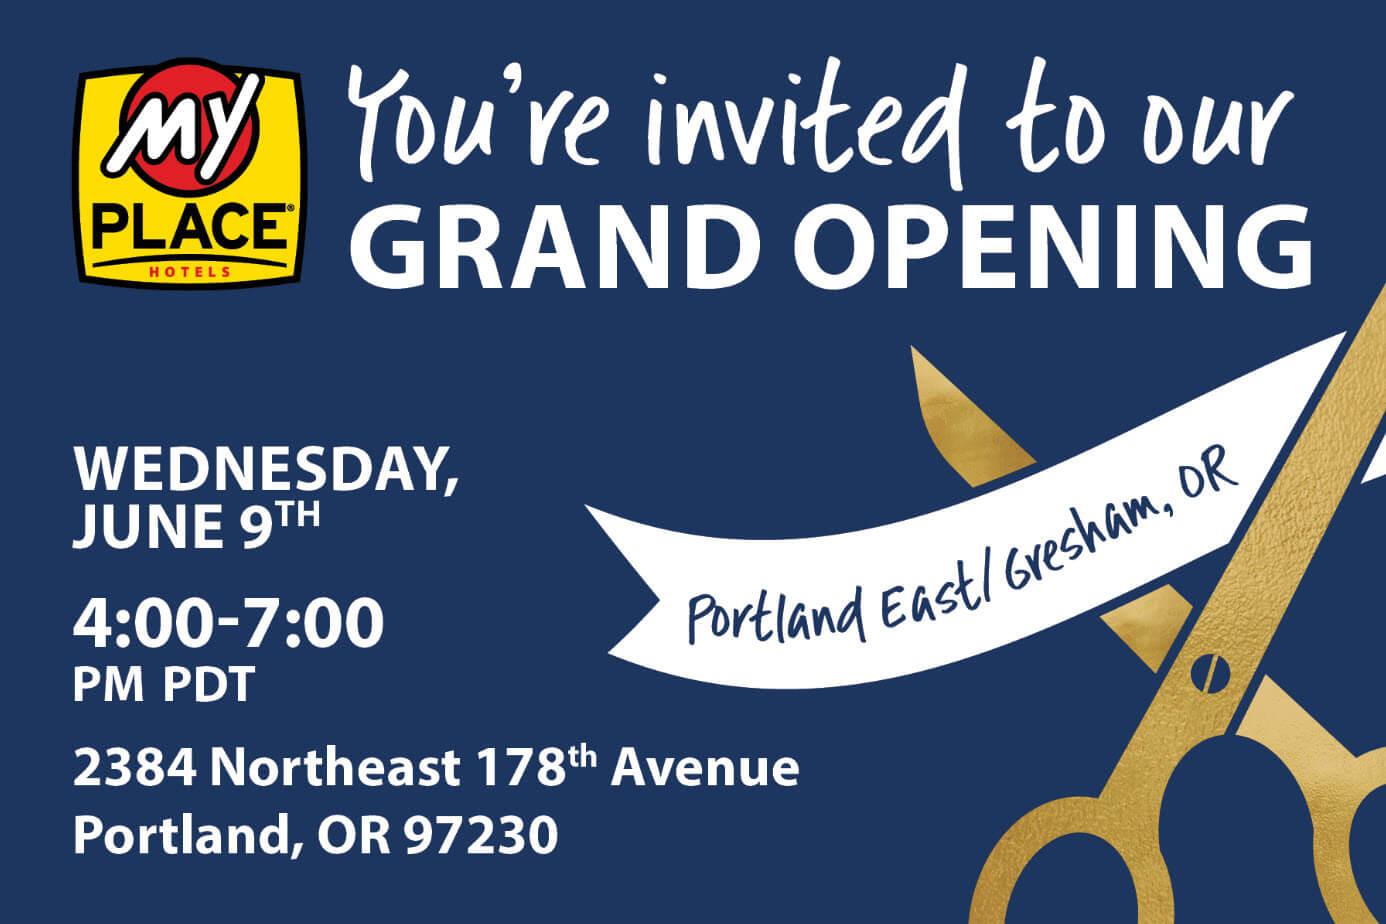 My Place East Portland Gresham Grand Opening